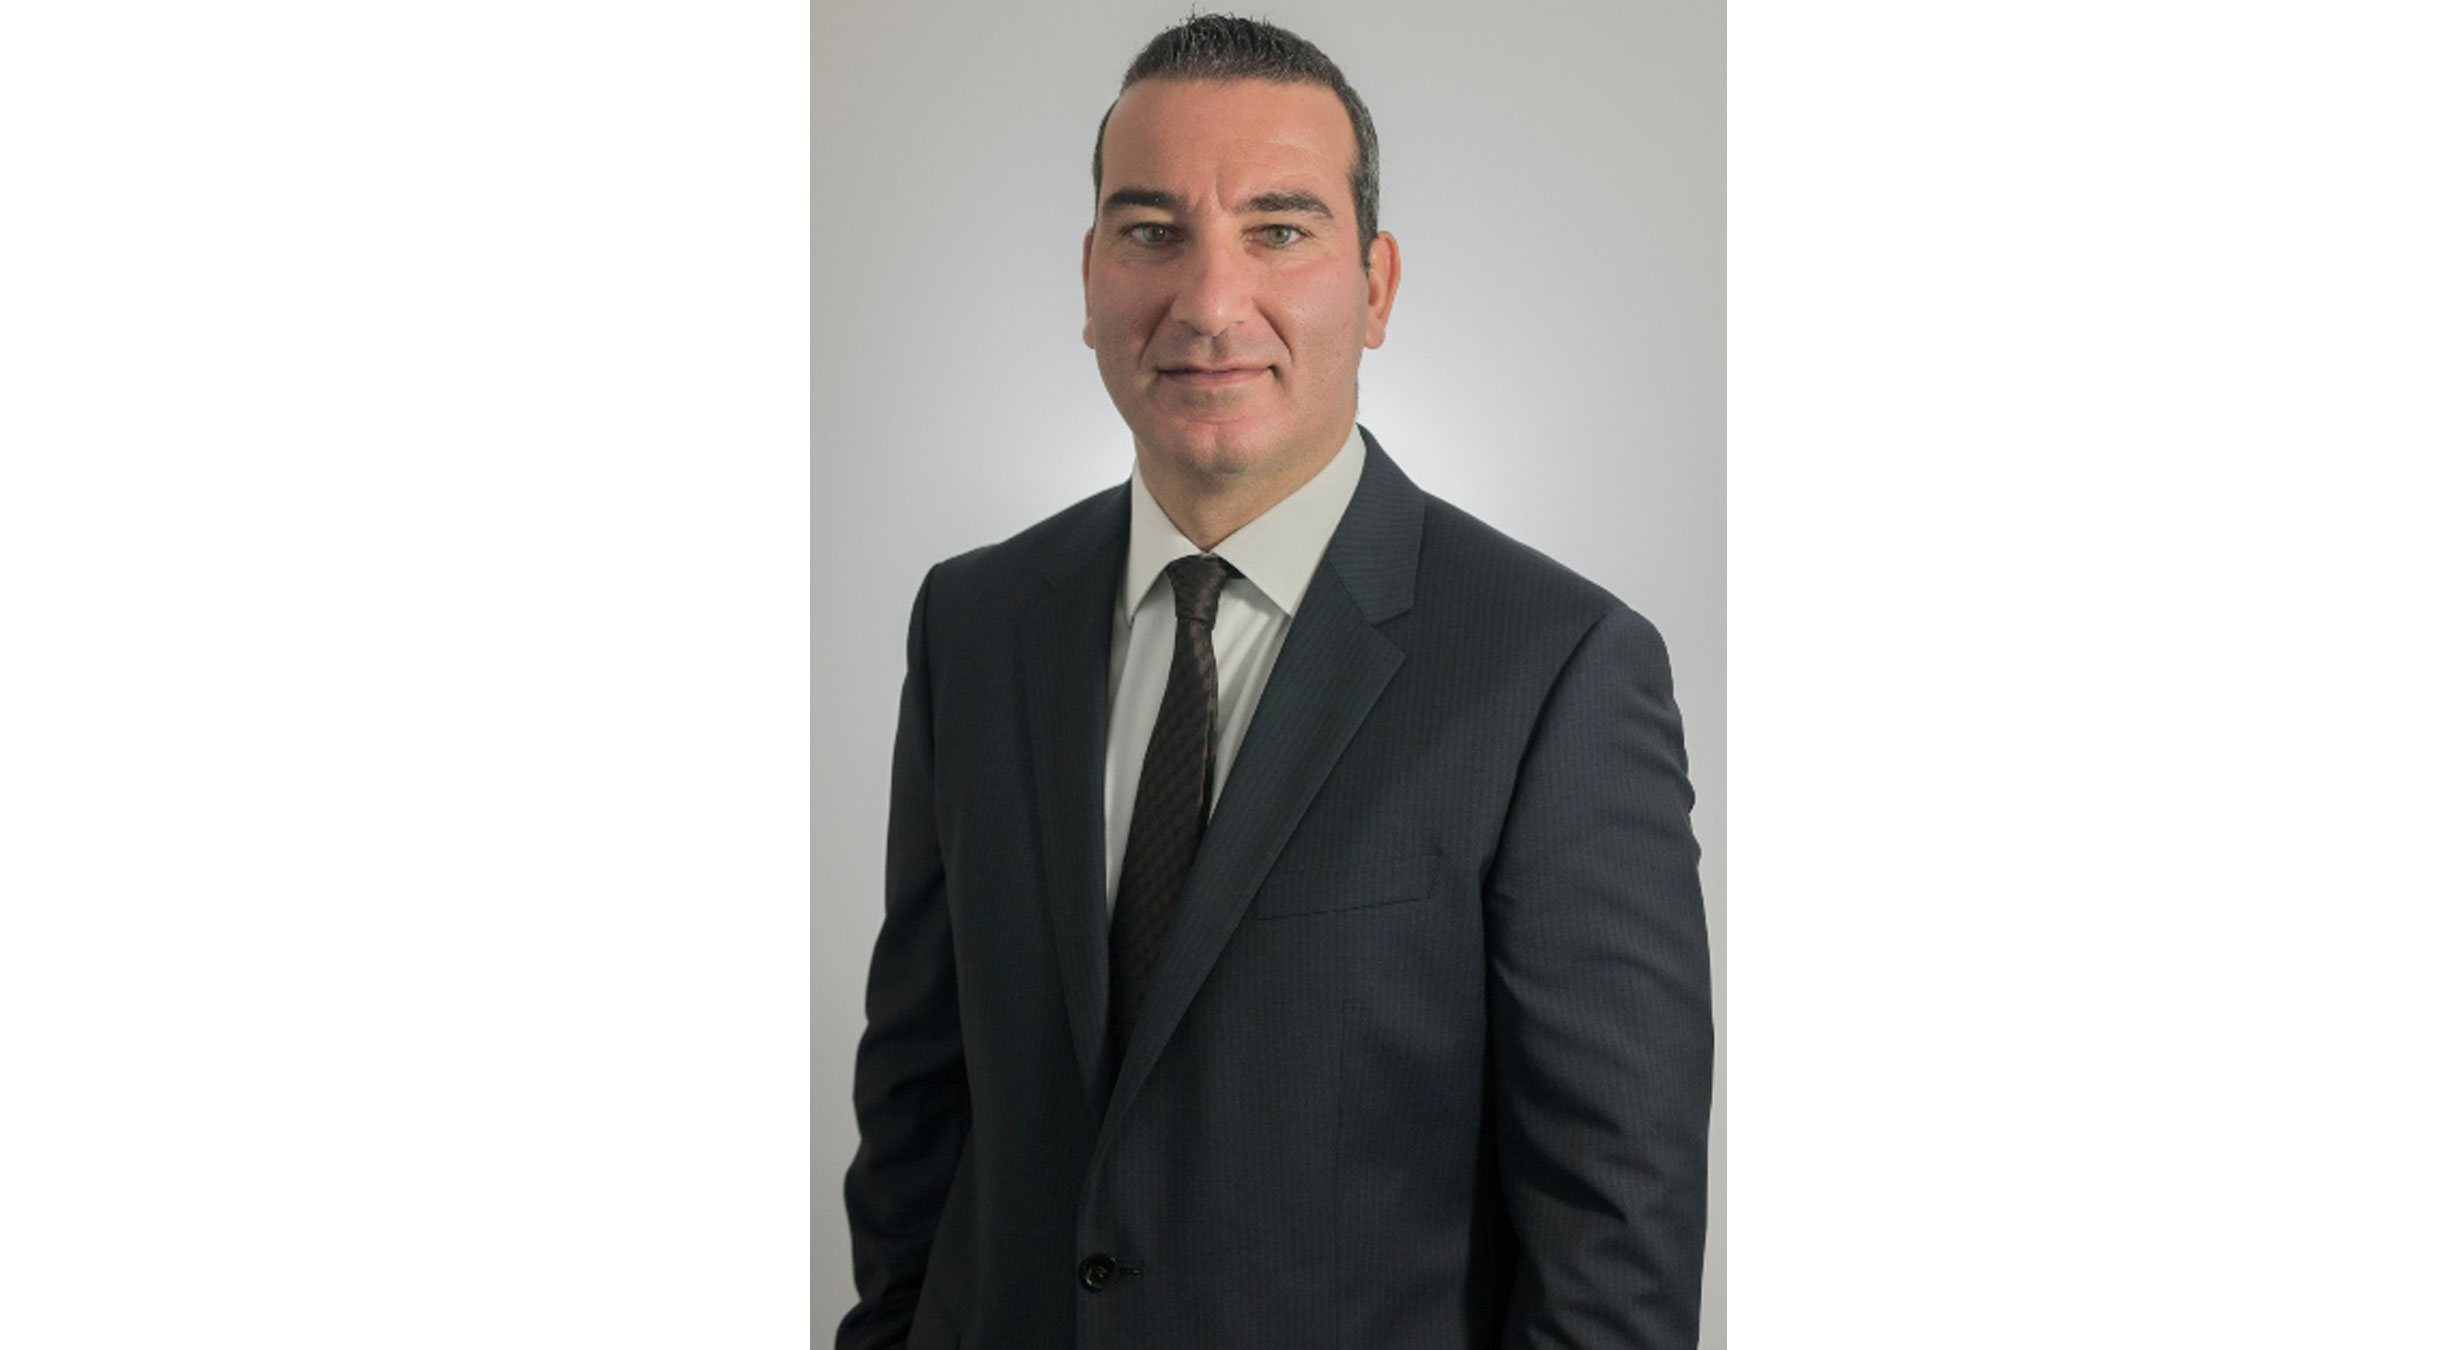 CEO ΙWG: «Έως το 2030 το 30% των εργαζομένων σε μεγάλες εταιρείες θα δουλεύει από μακριά»